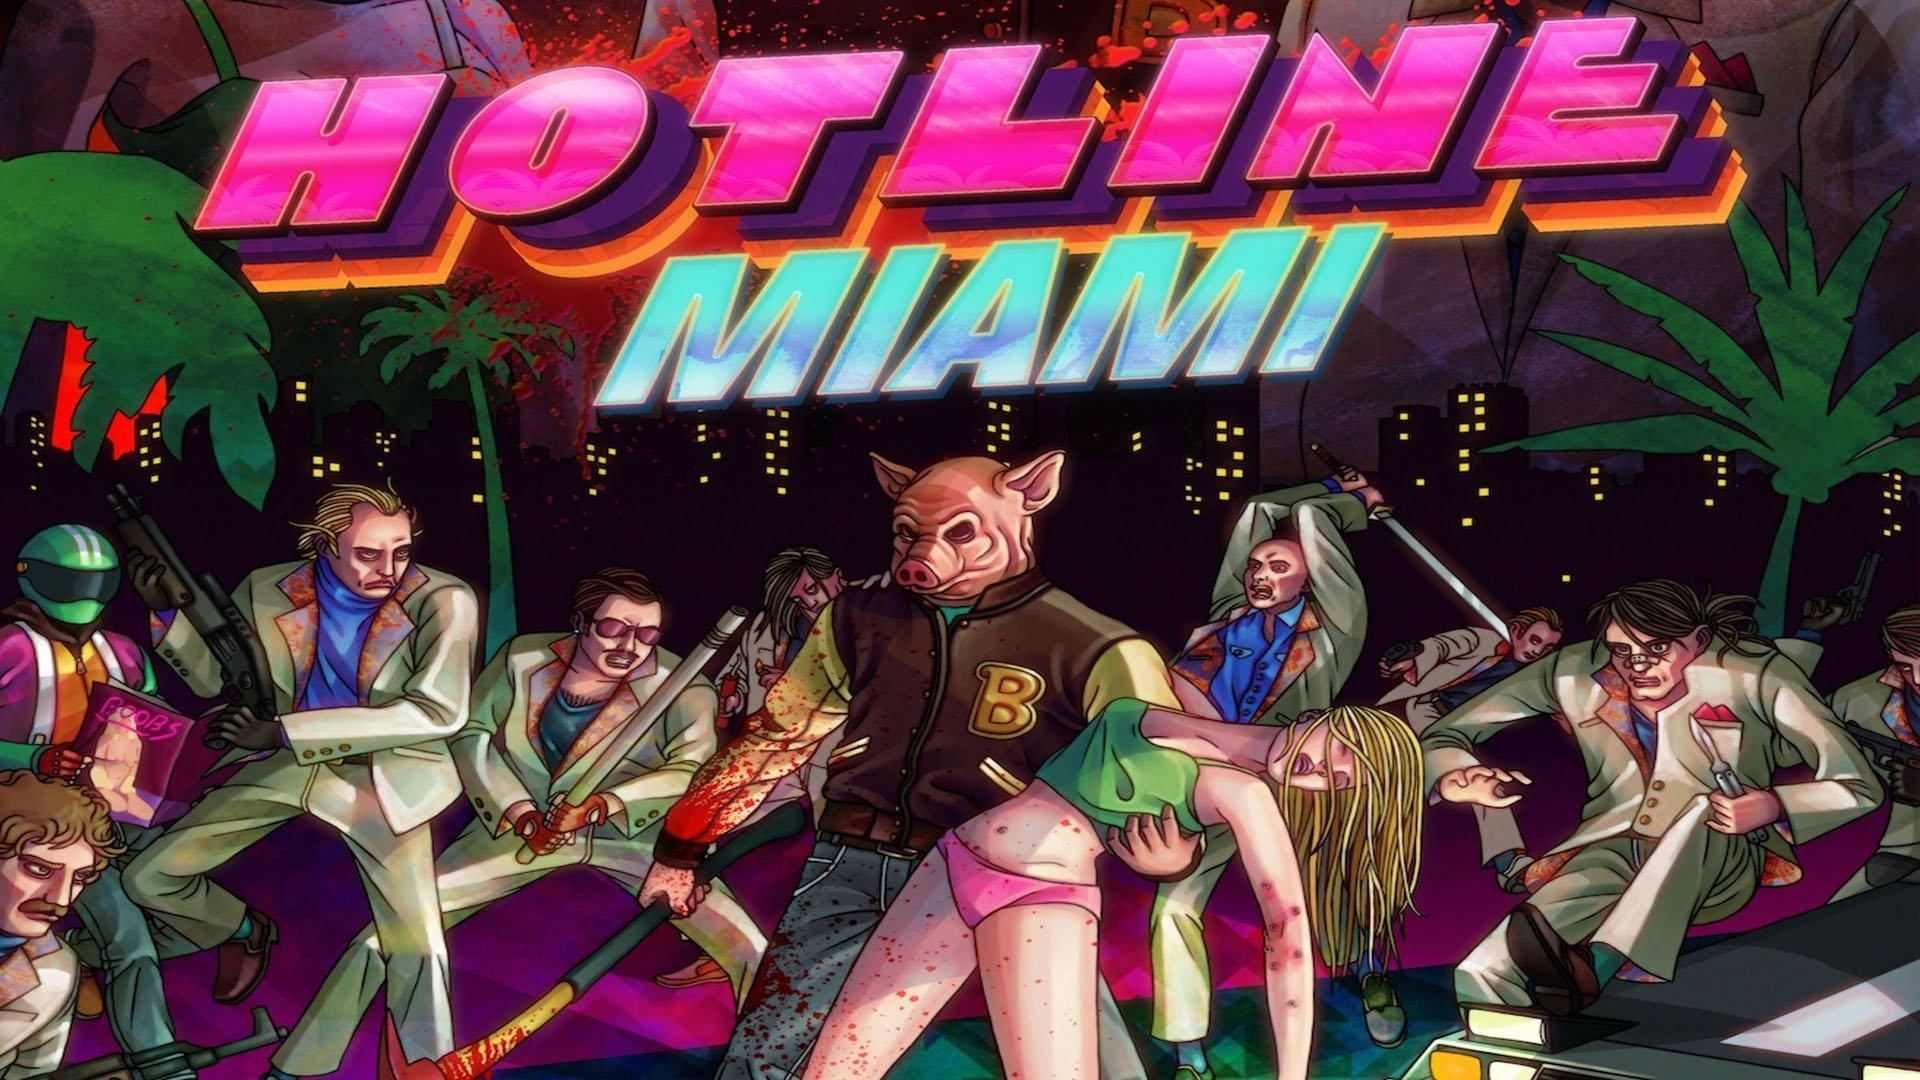 Hotline Miami Wallpaper 1920x1080: HOTLINE-MIAMI Action Shooter Fighting Hotline Miami Payday